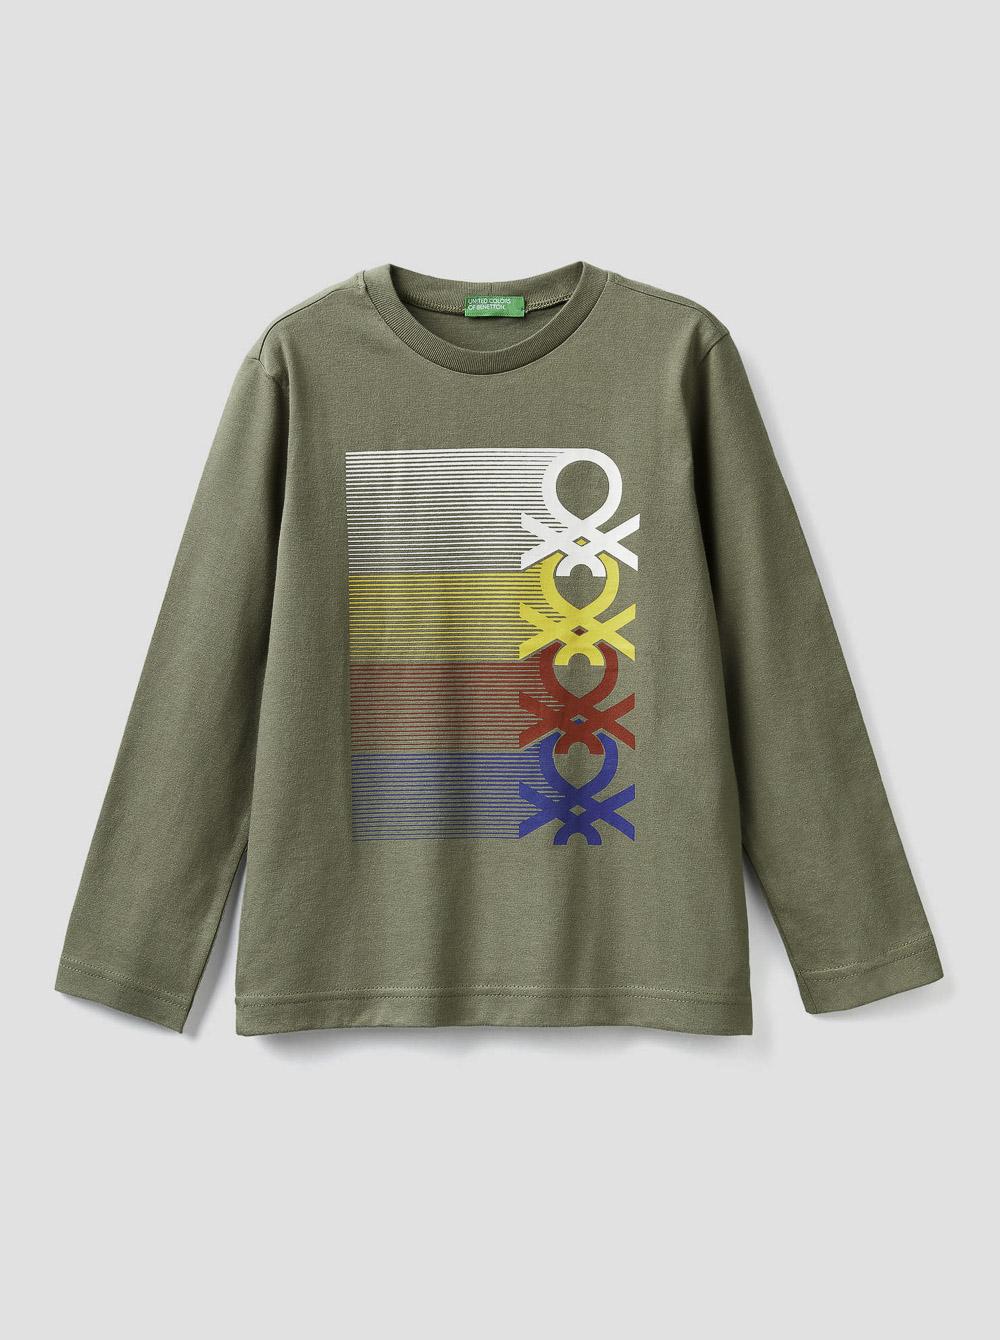 012 BENETTON Τ-shirt μακρυμάνικο με λογότυπο 3YR3C14QF 20A34F